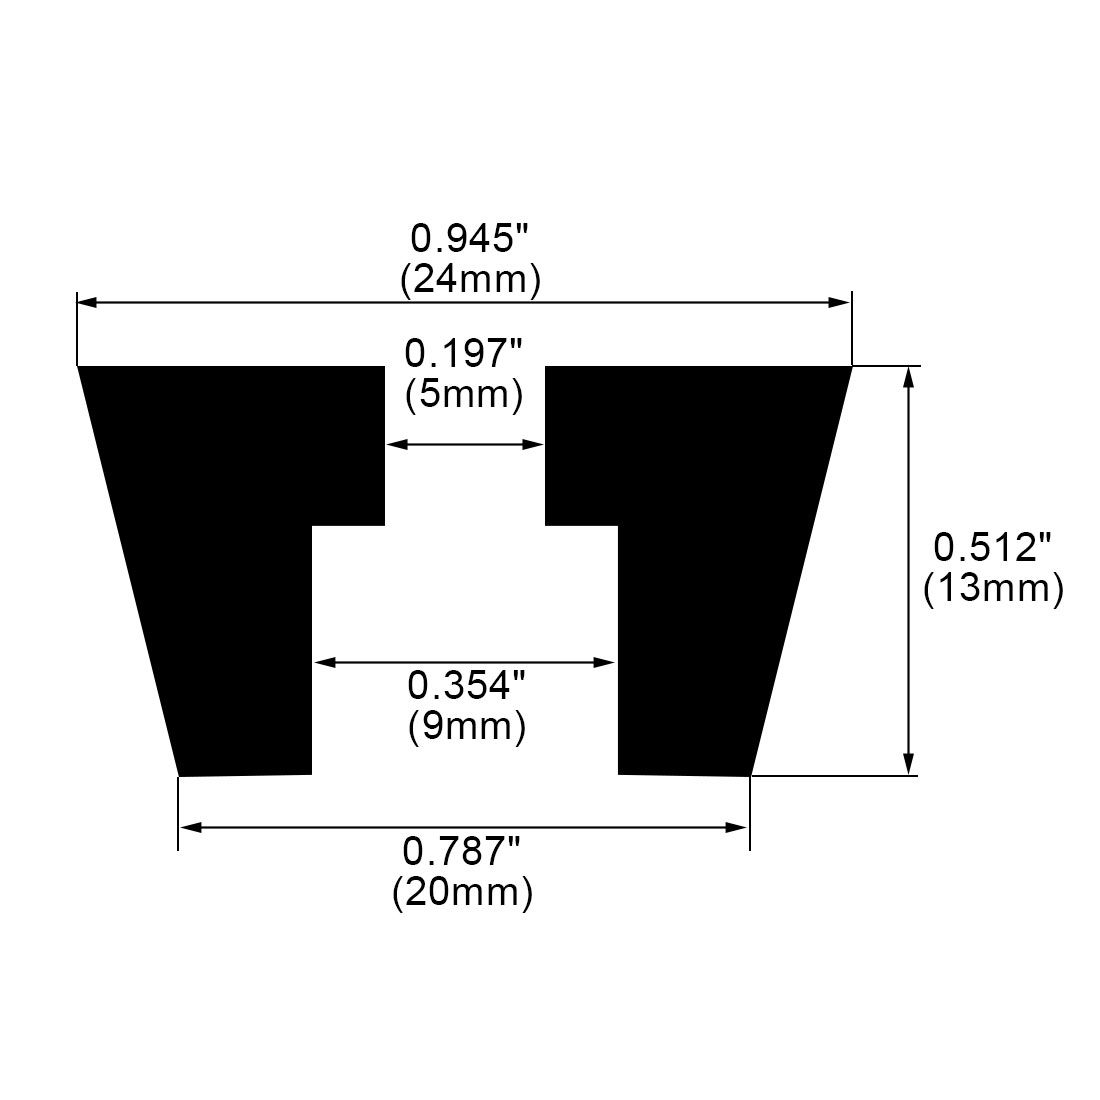 26pcs Rubber Feet Bumper Furniture Table Speaker Cabinet Leg Pads, D24x20xH13mm - image 2 of 7